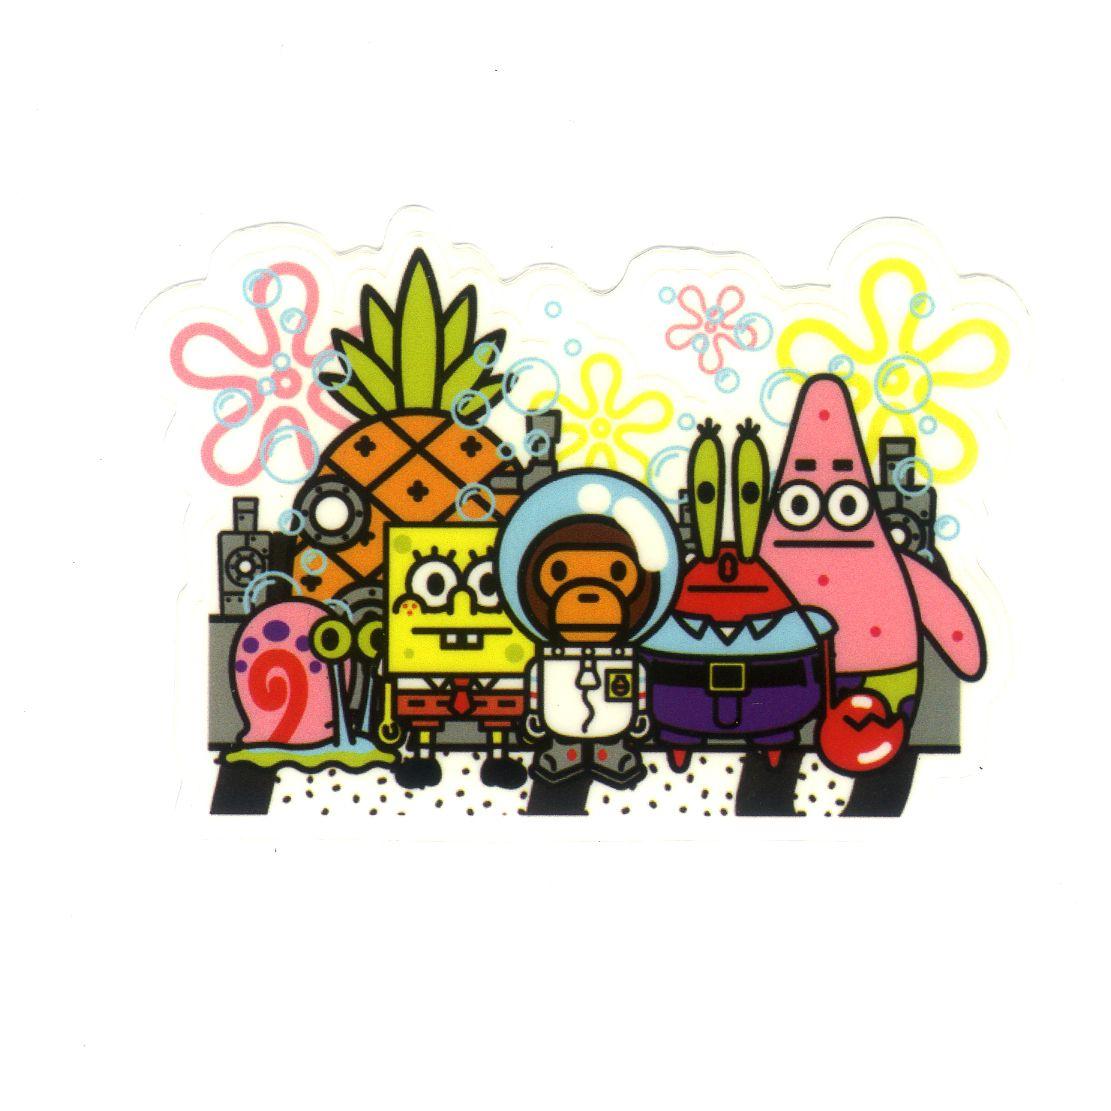 Spongebob squarepants and friends baby